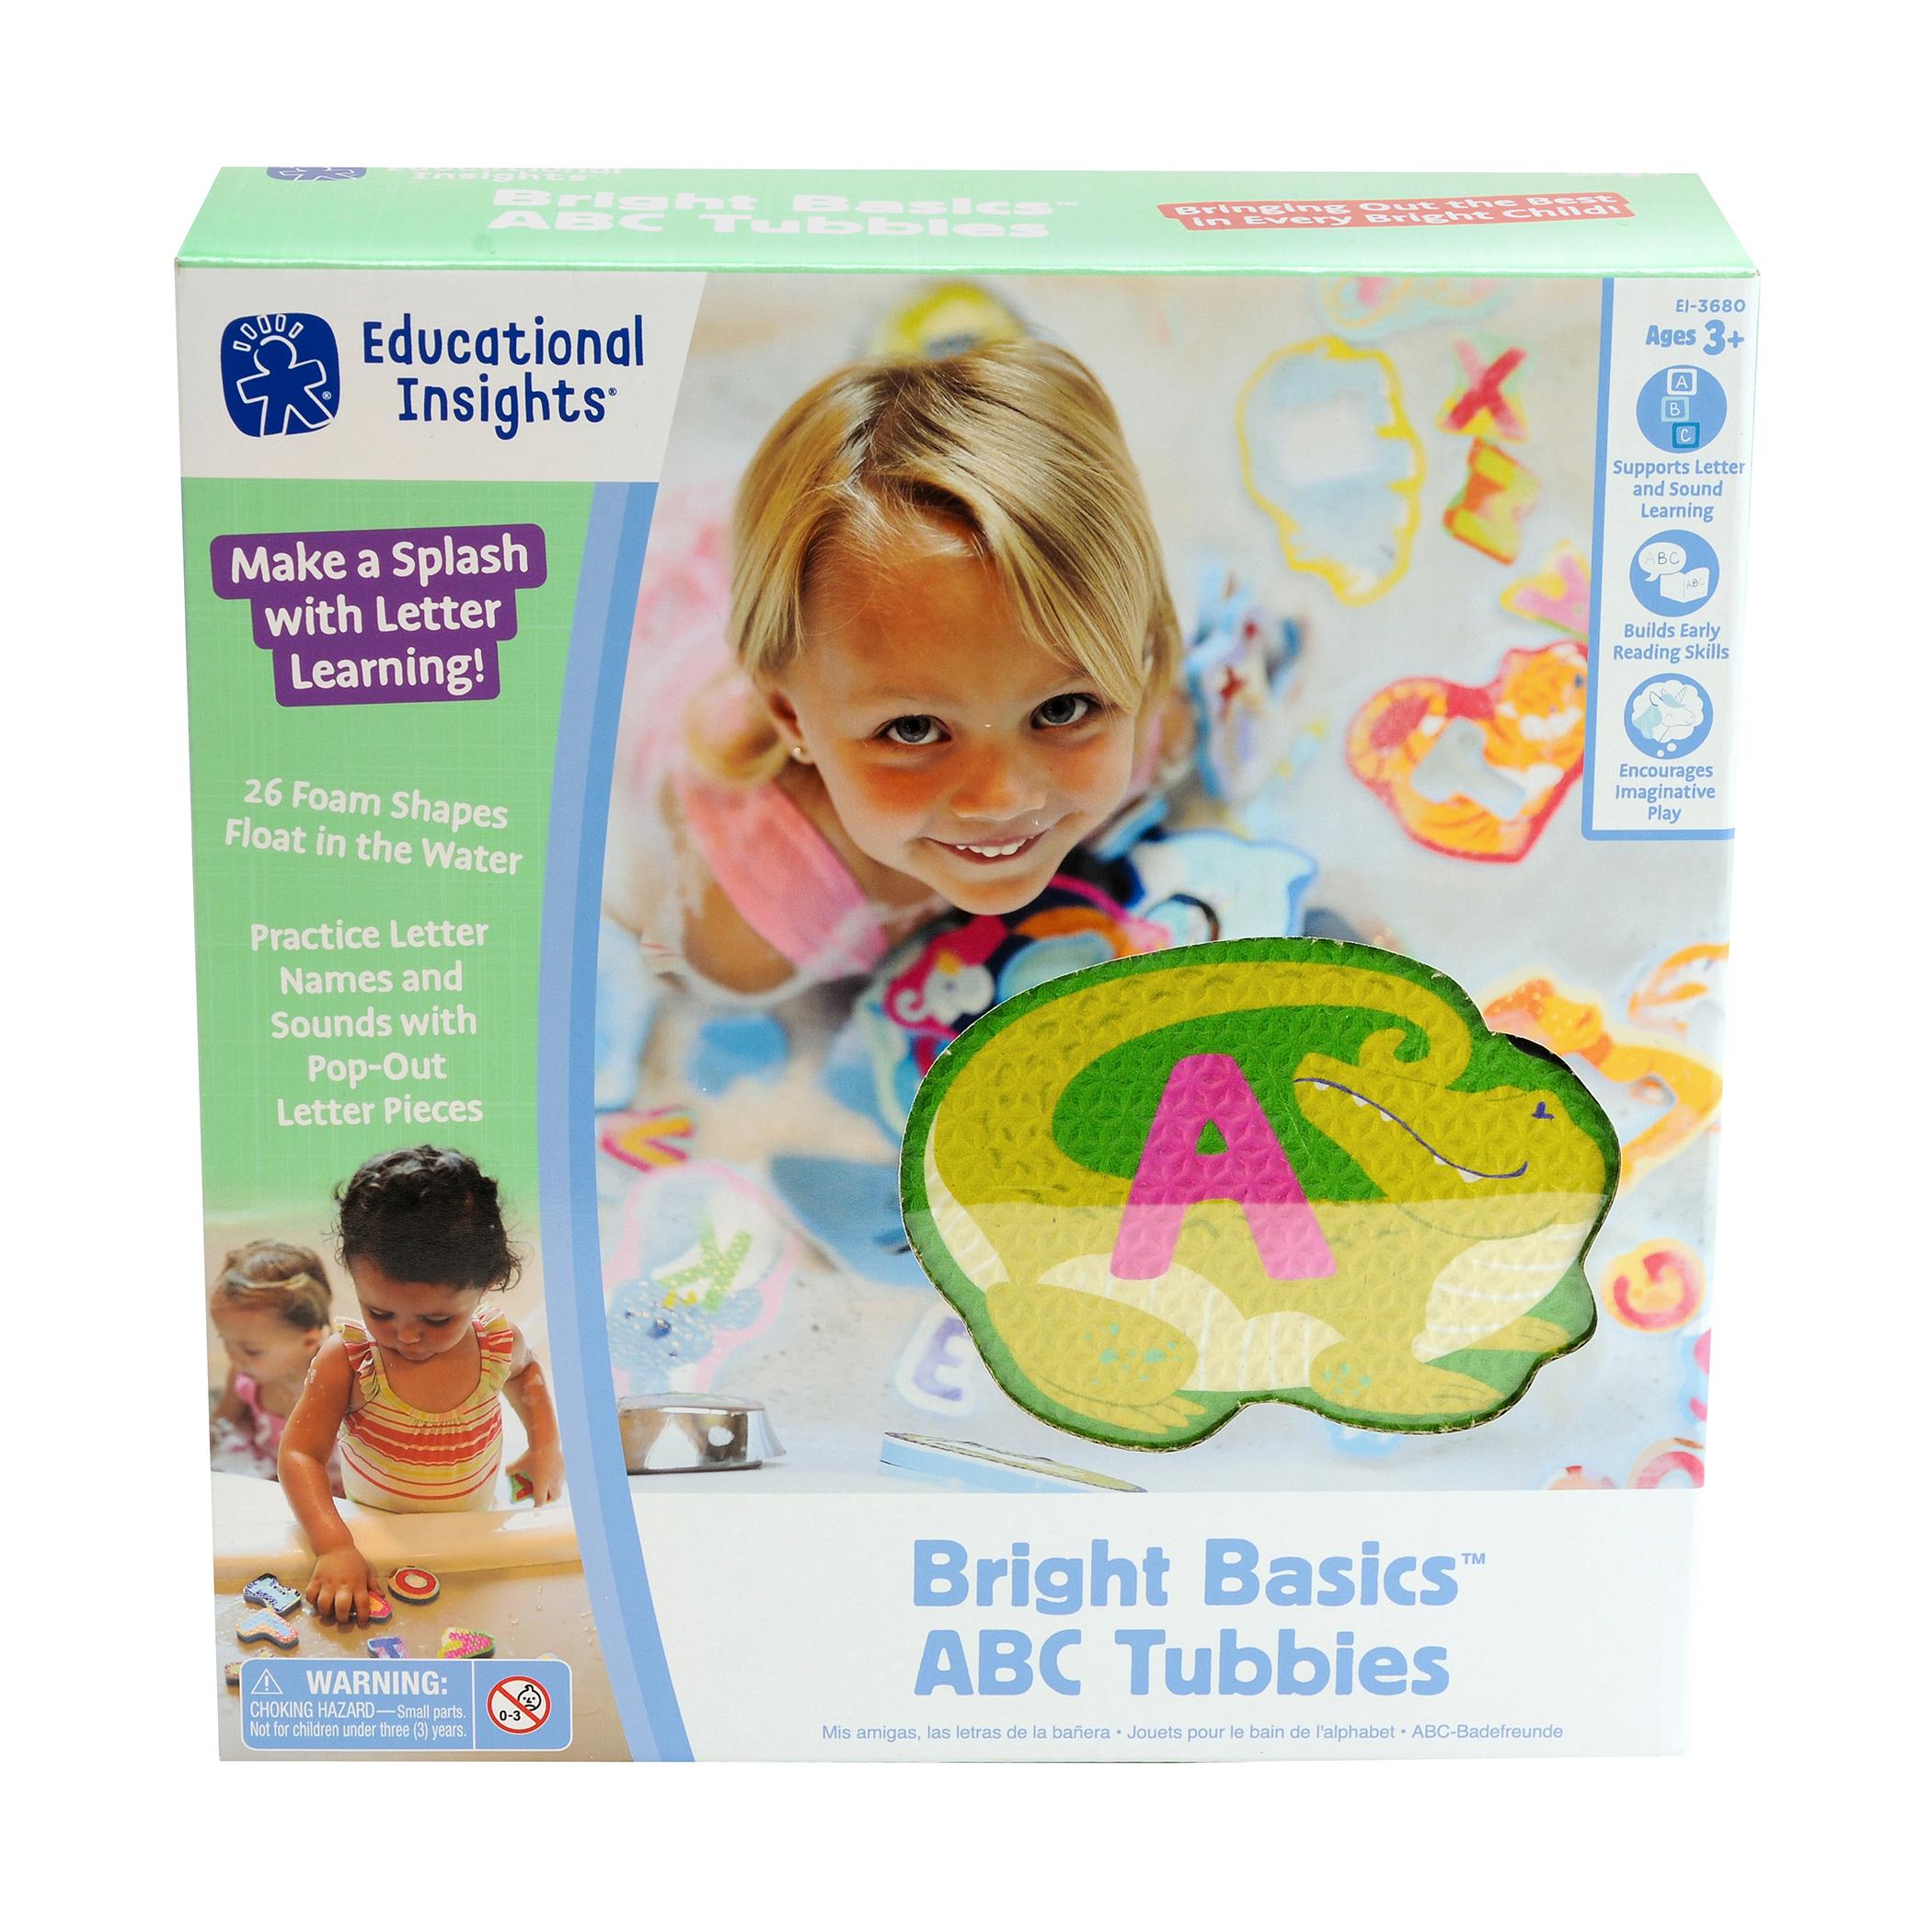 Image of Educational Insights Bright Basics ABC Tubbies